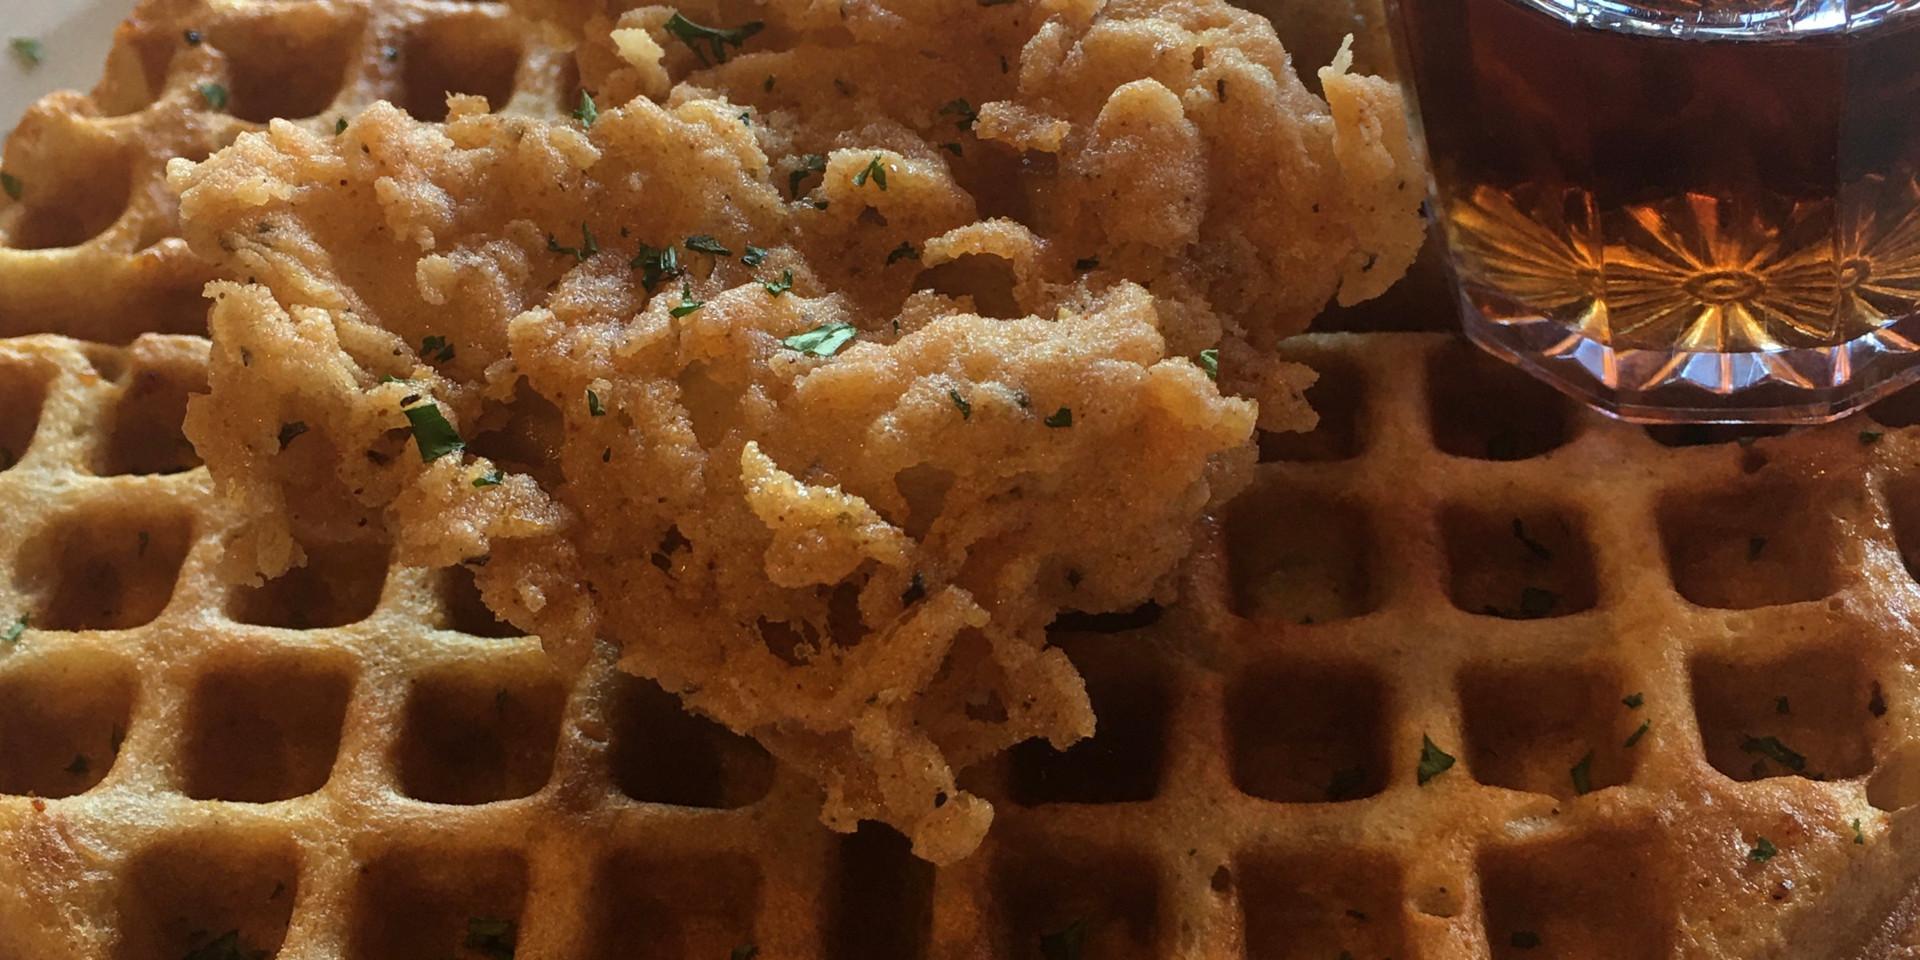 G/F Chicken & Waffles